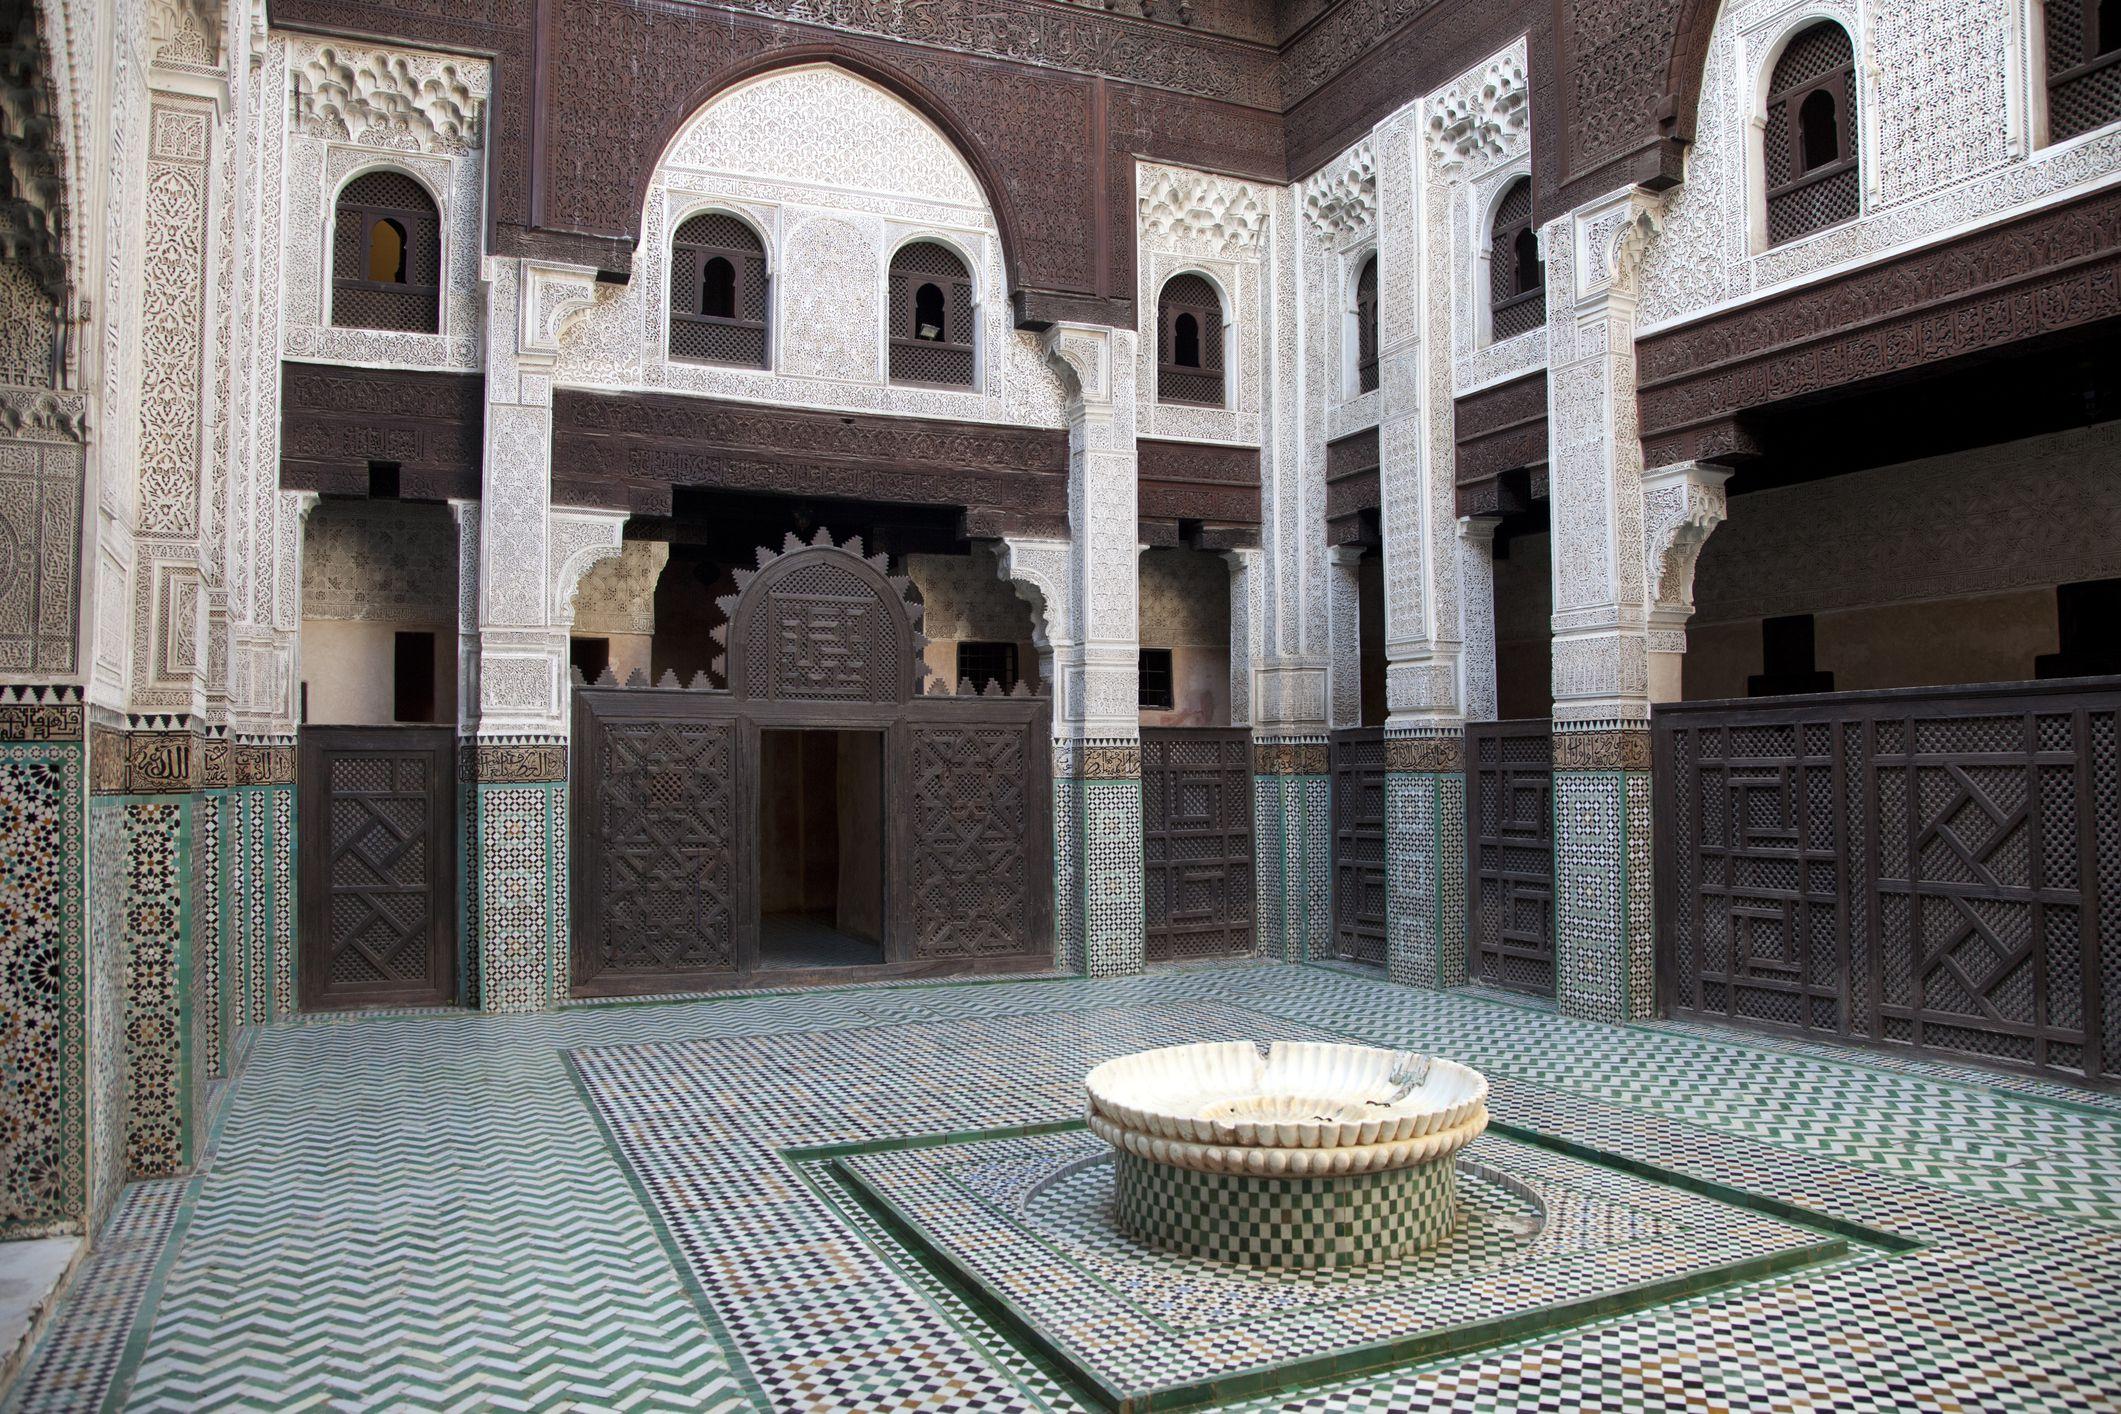 Courtyard of Bou Inania Medersa, Meknes